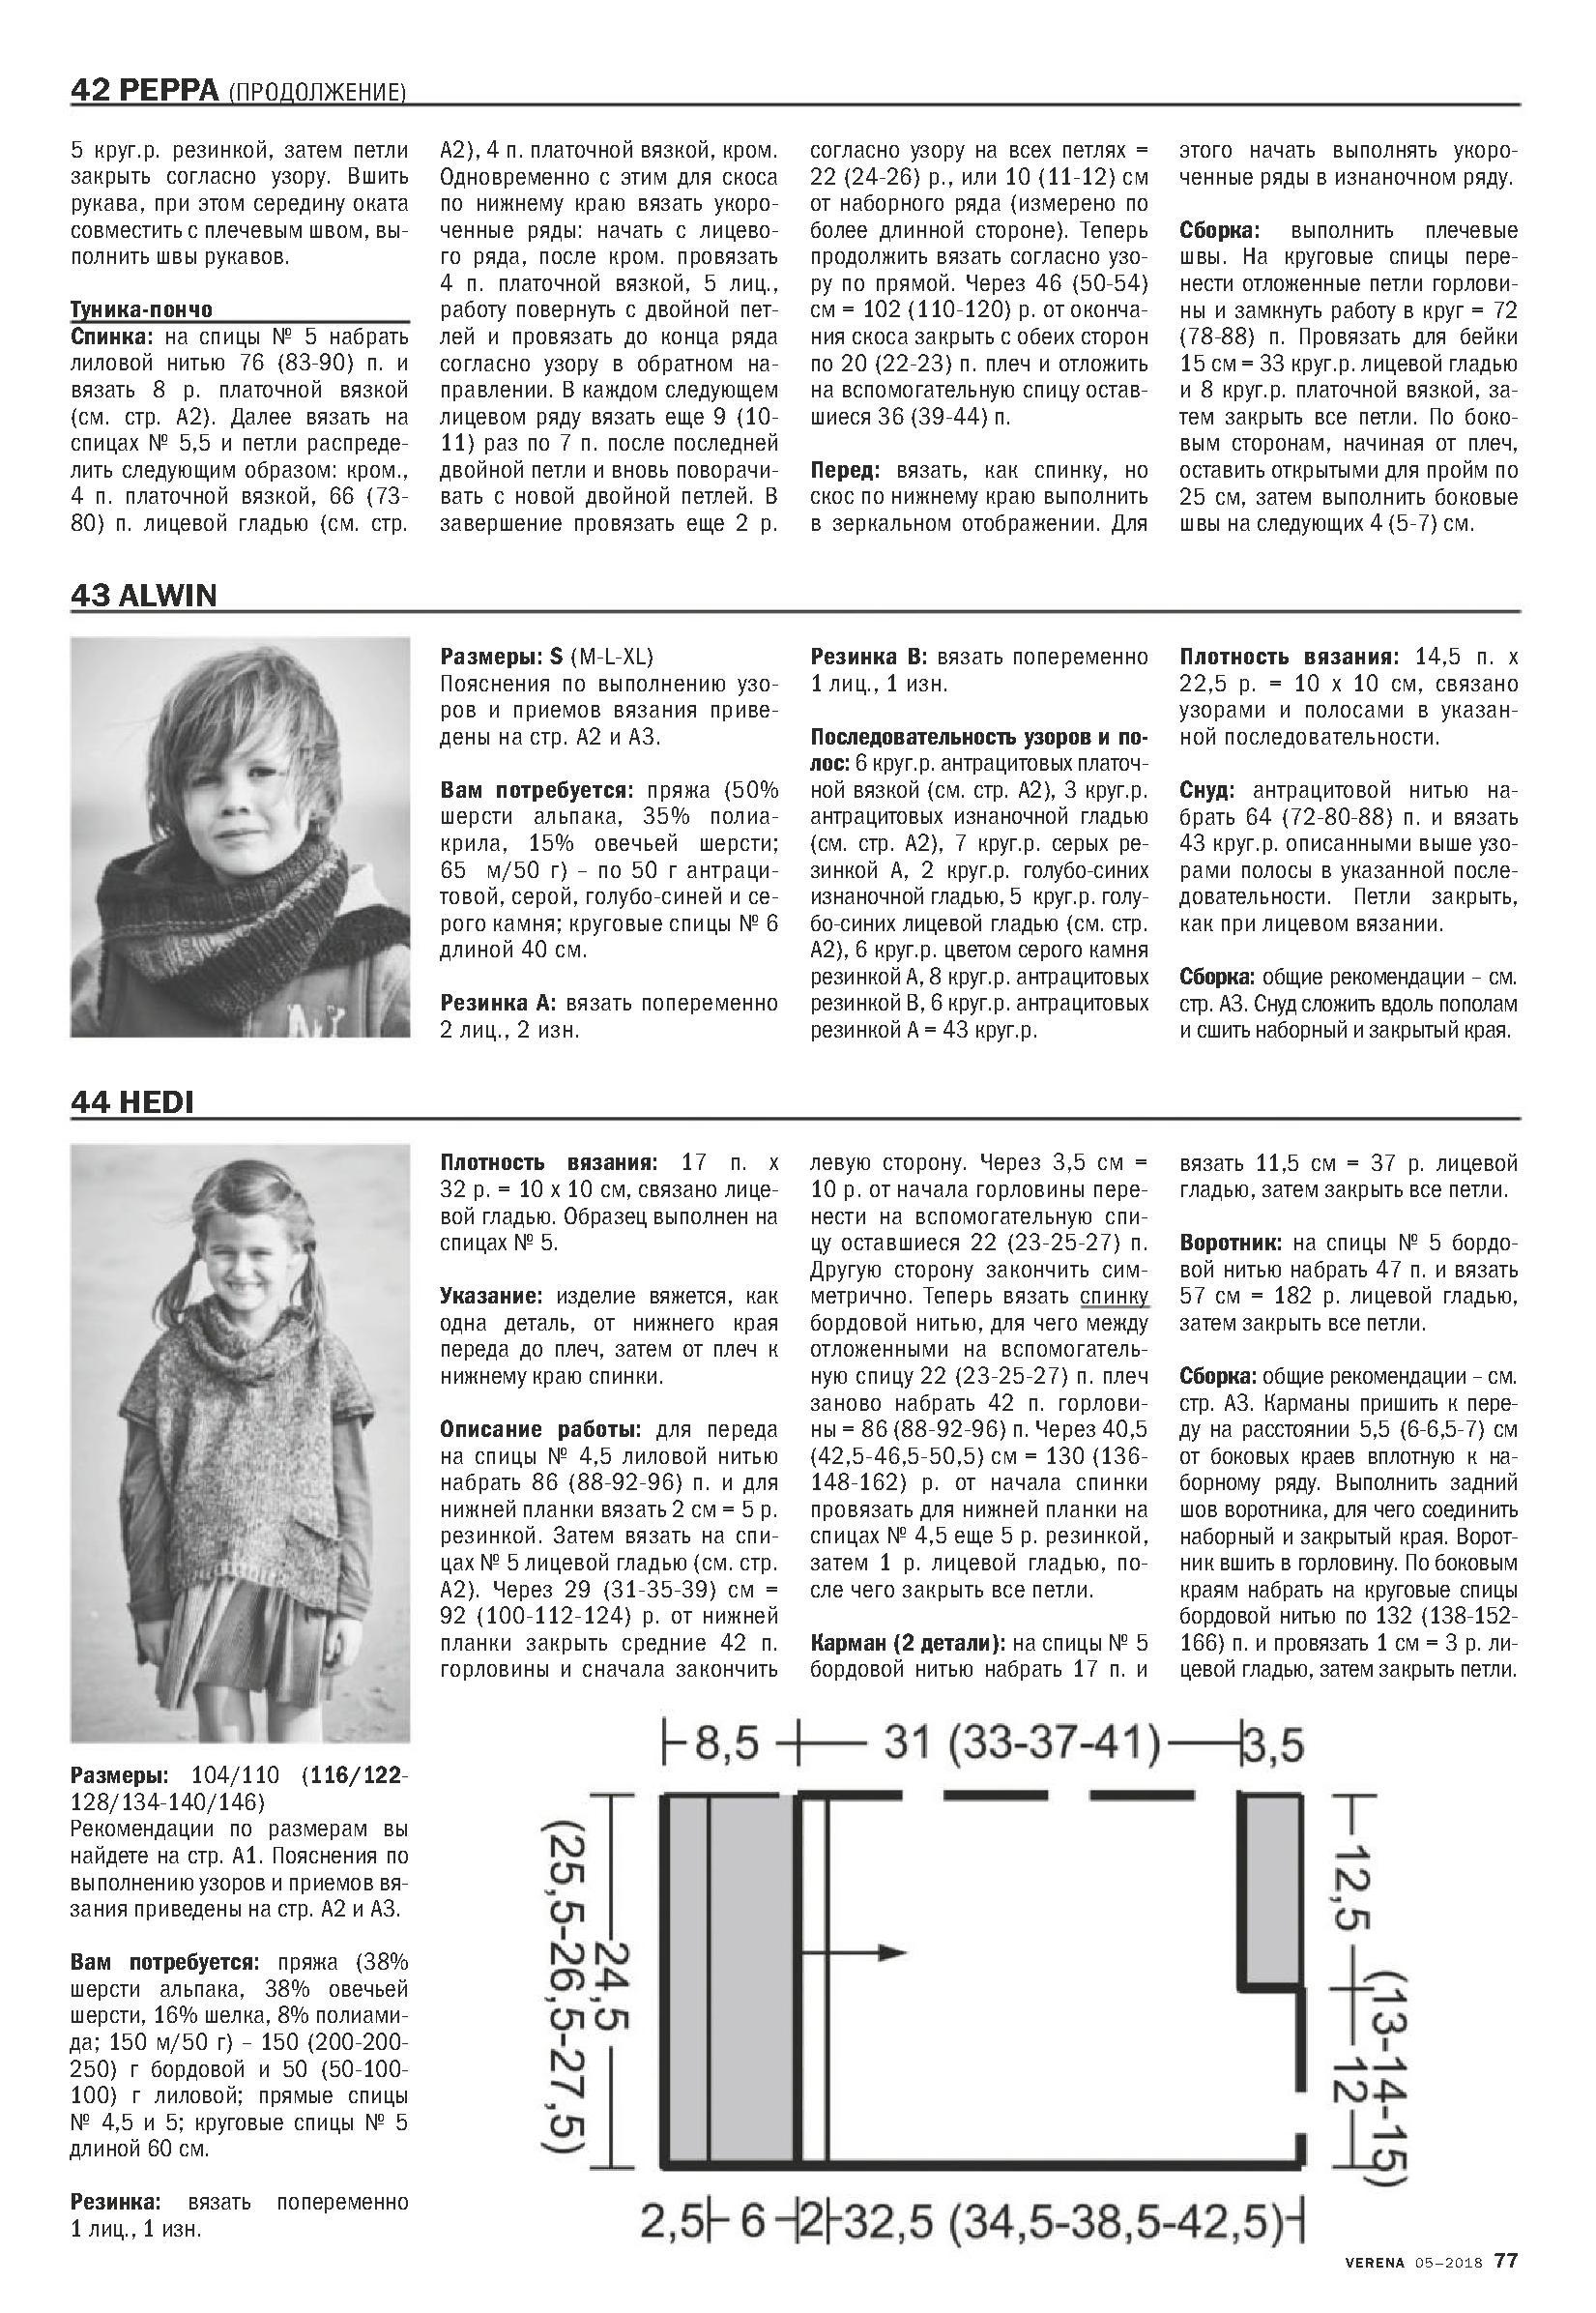 Page_00078.jpg